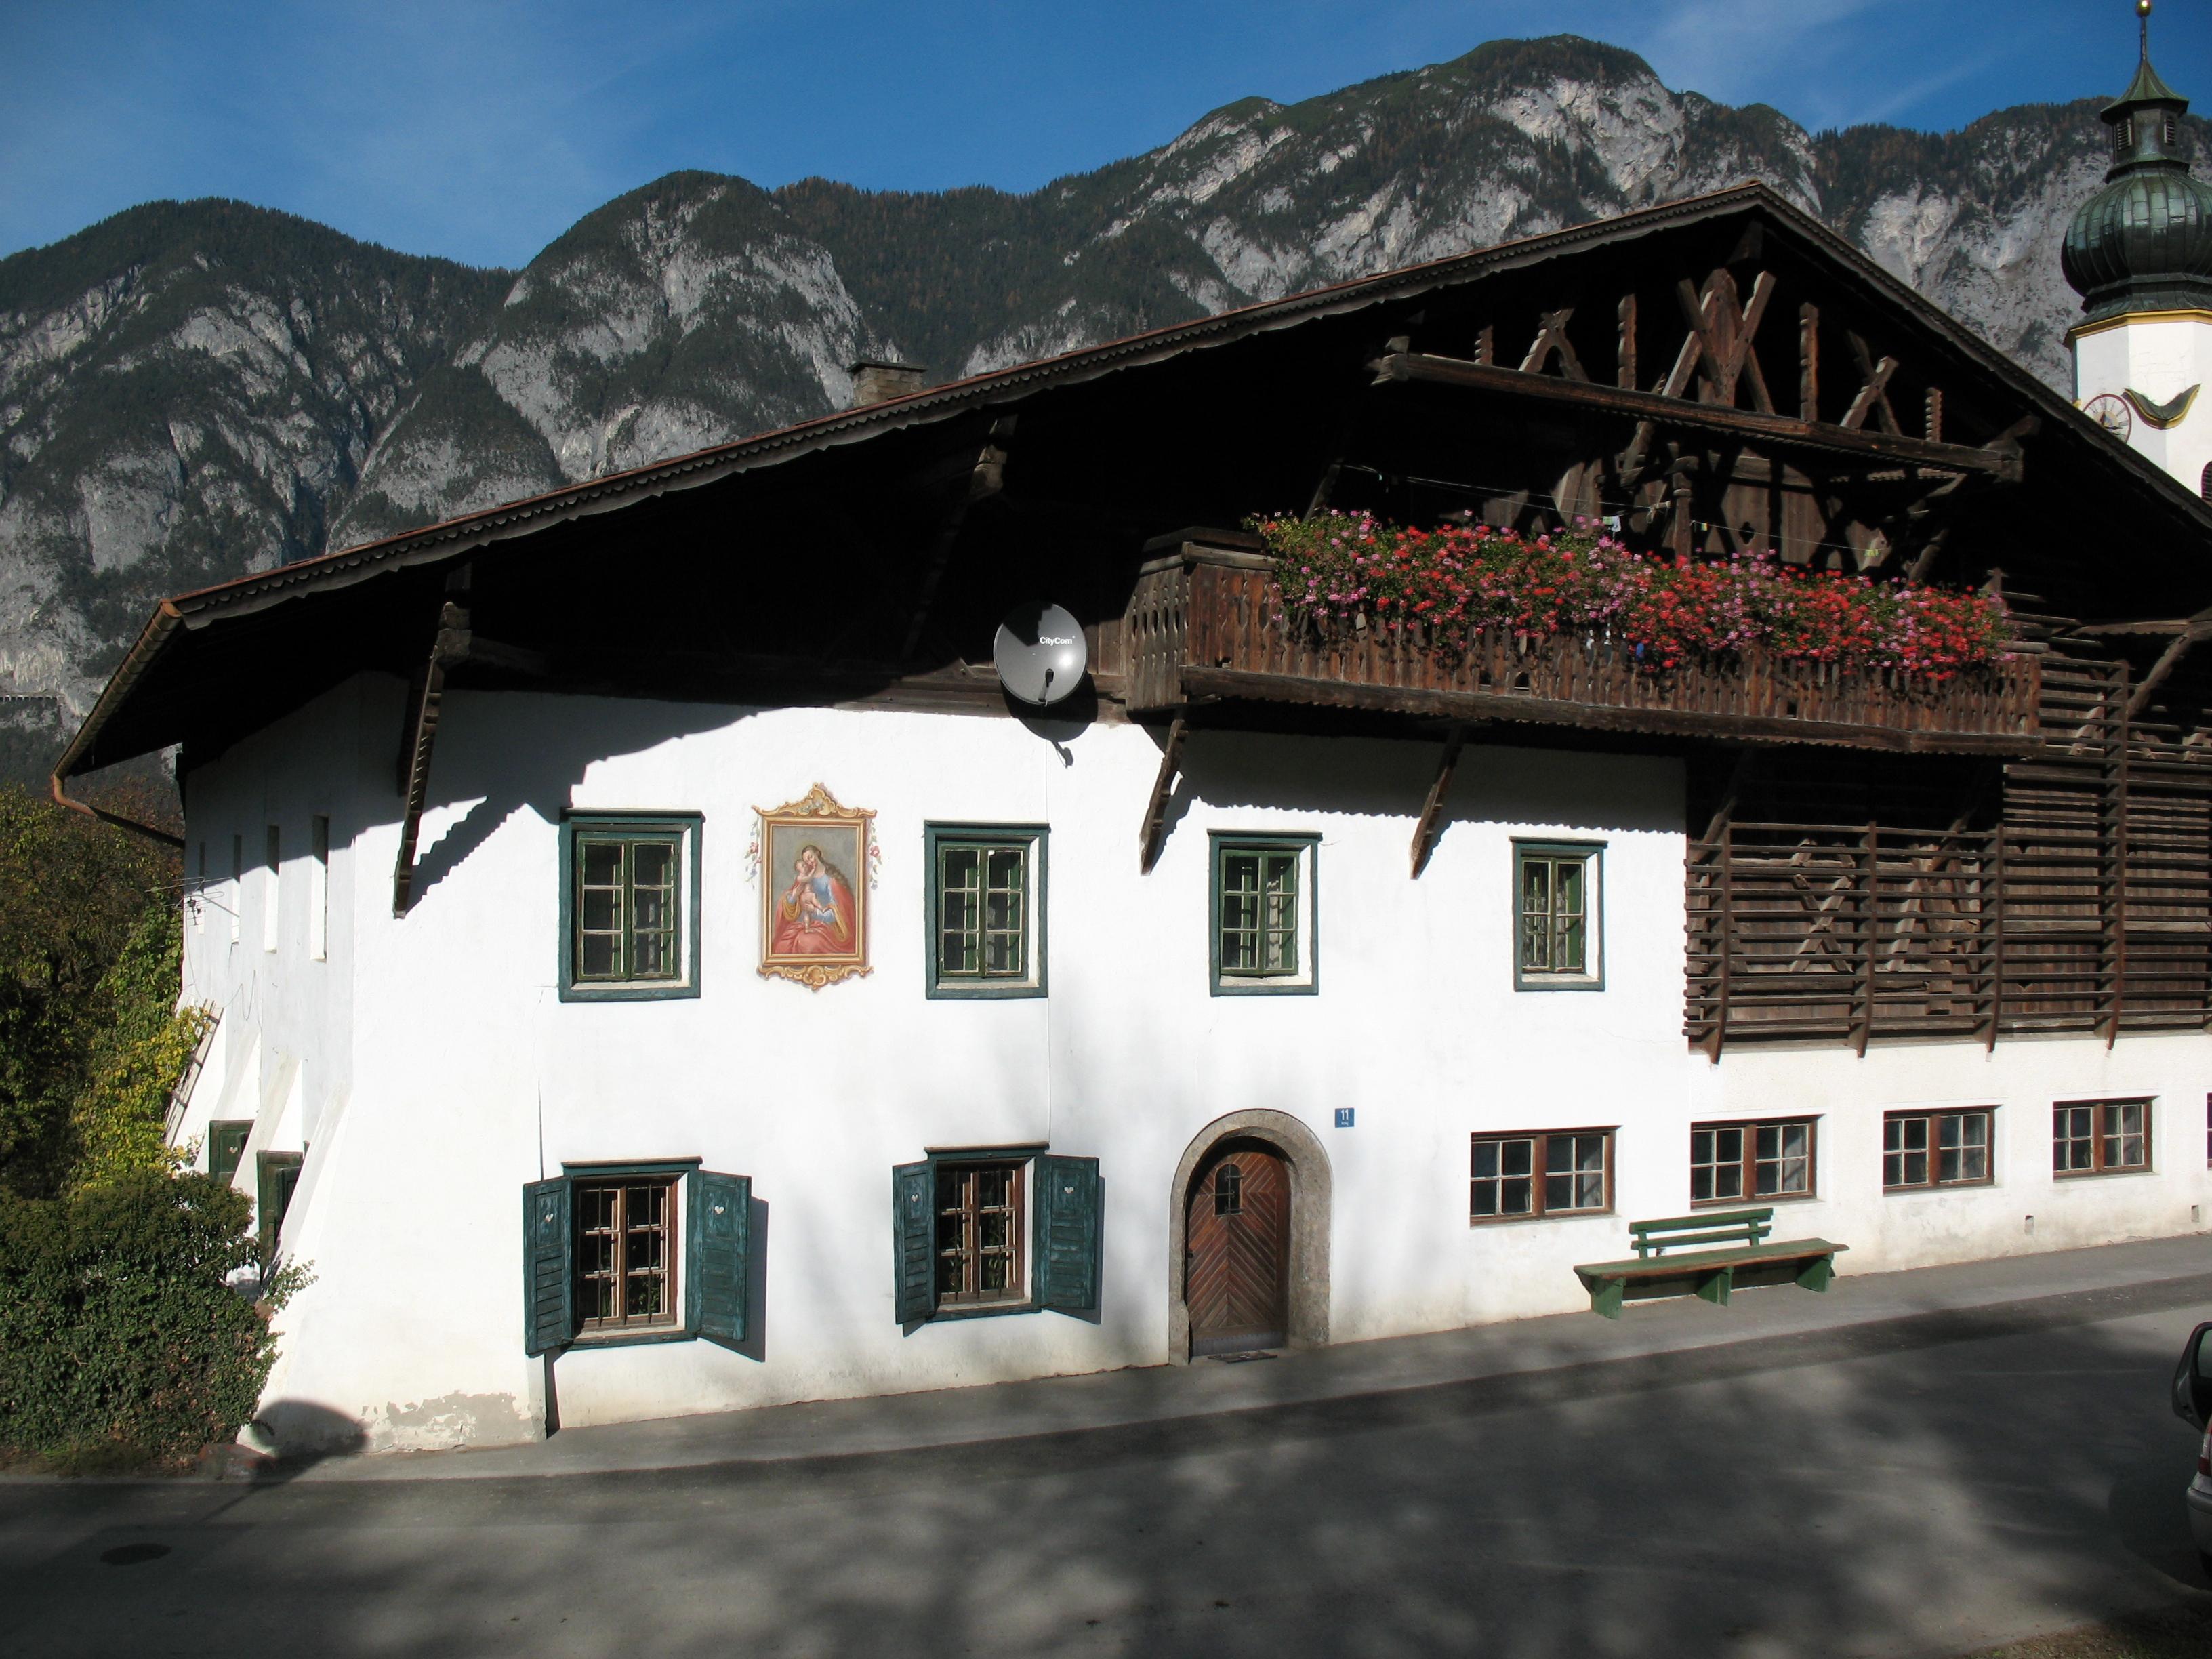 Datei:Kematen in Tirol im Bezirk bubble-sheet.com Wikipedia